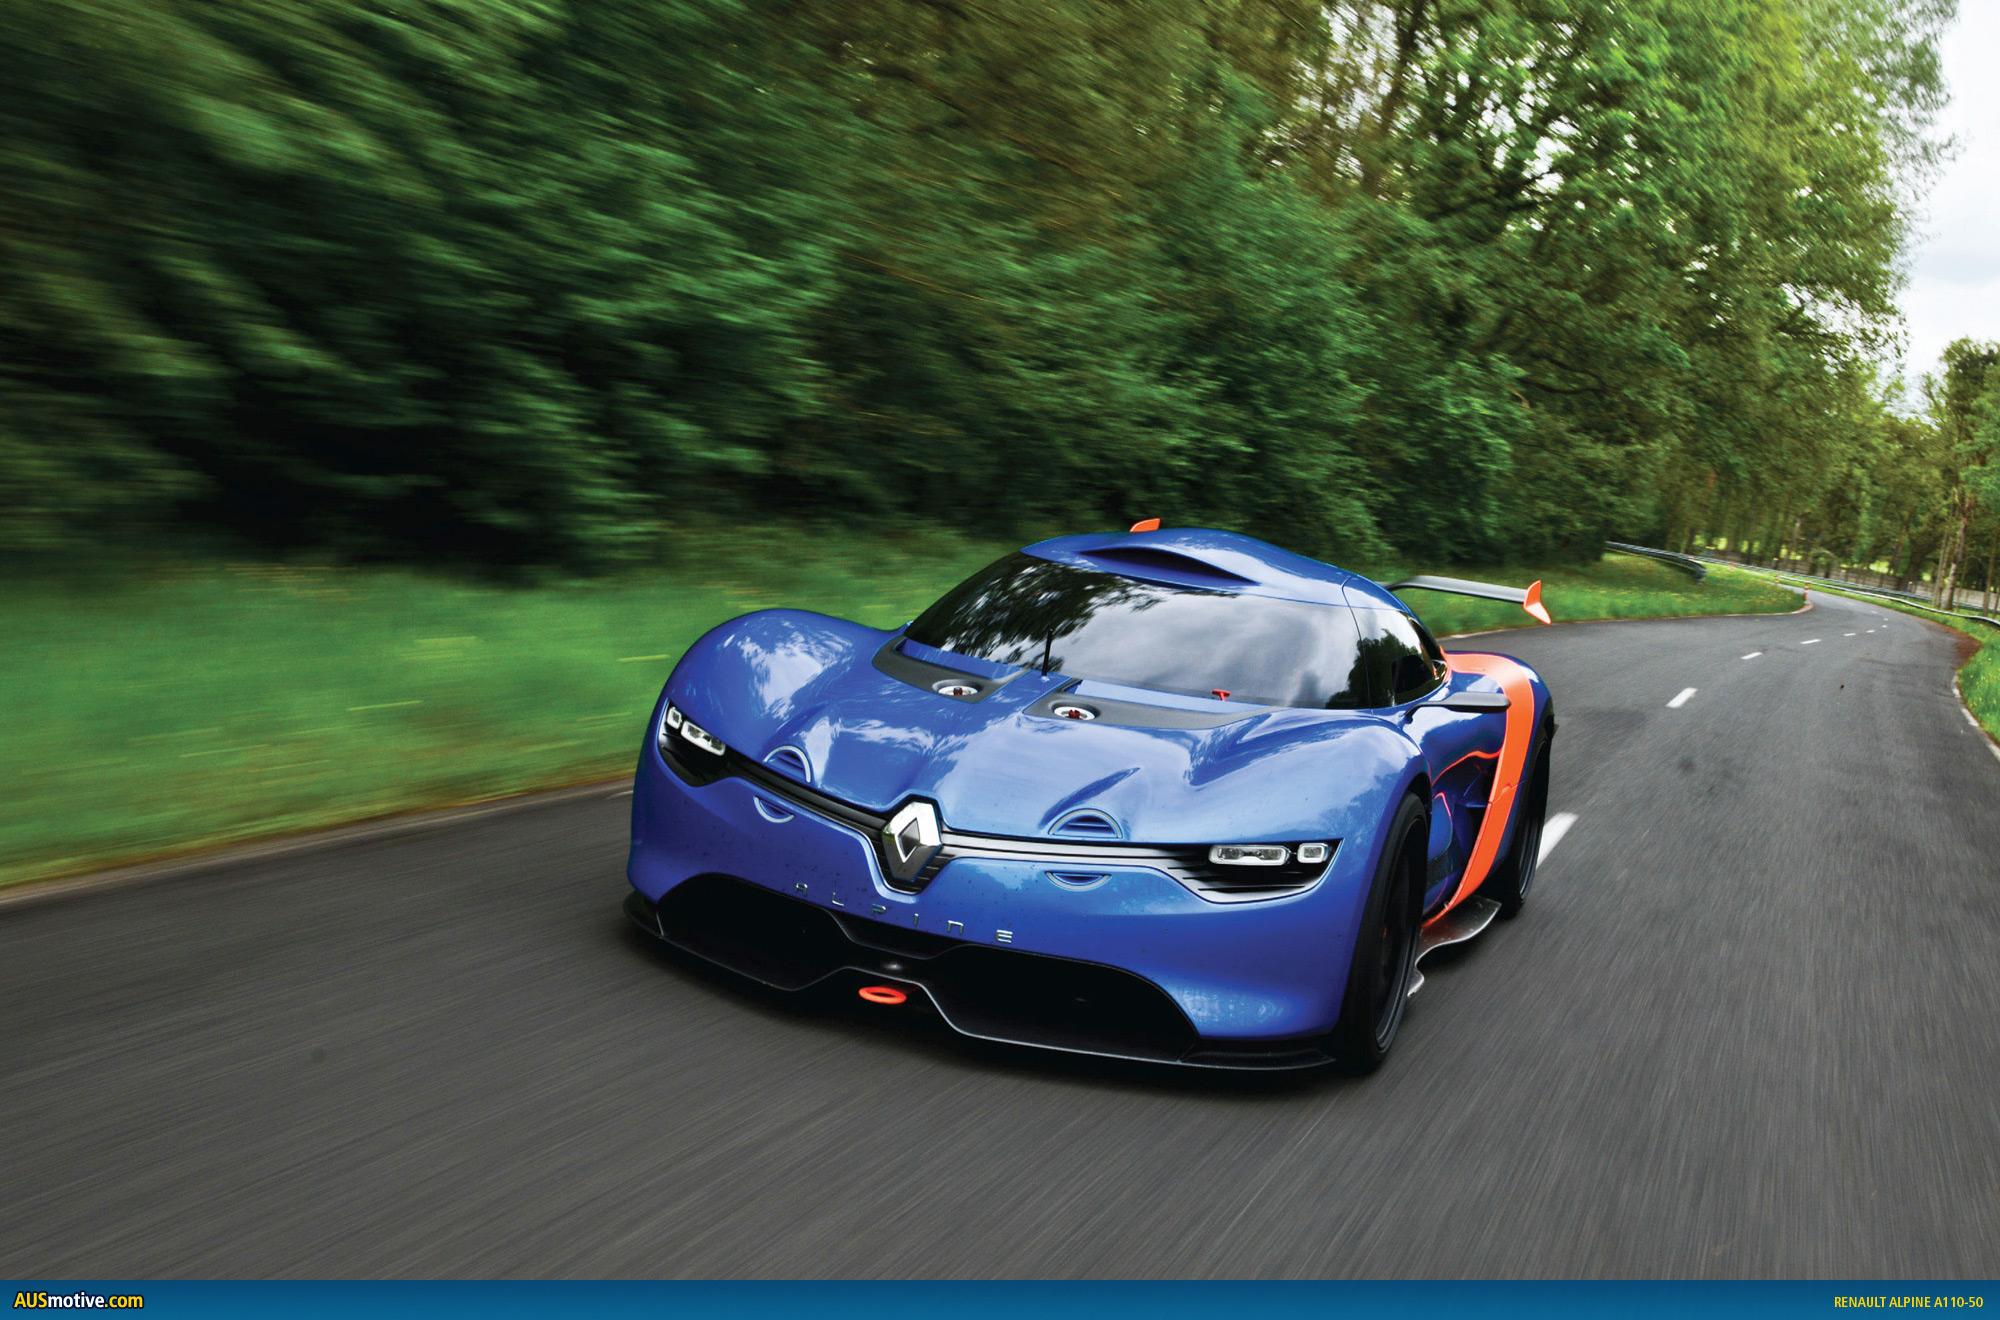 Renault Alpine A110 unveils stunning concept car photos Wallpapers HD